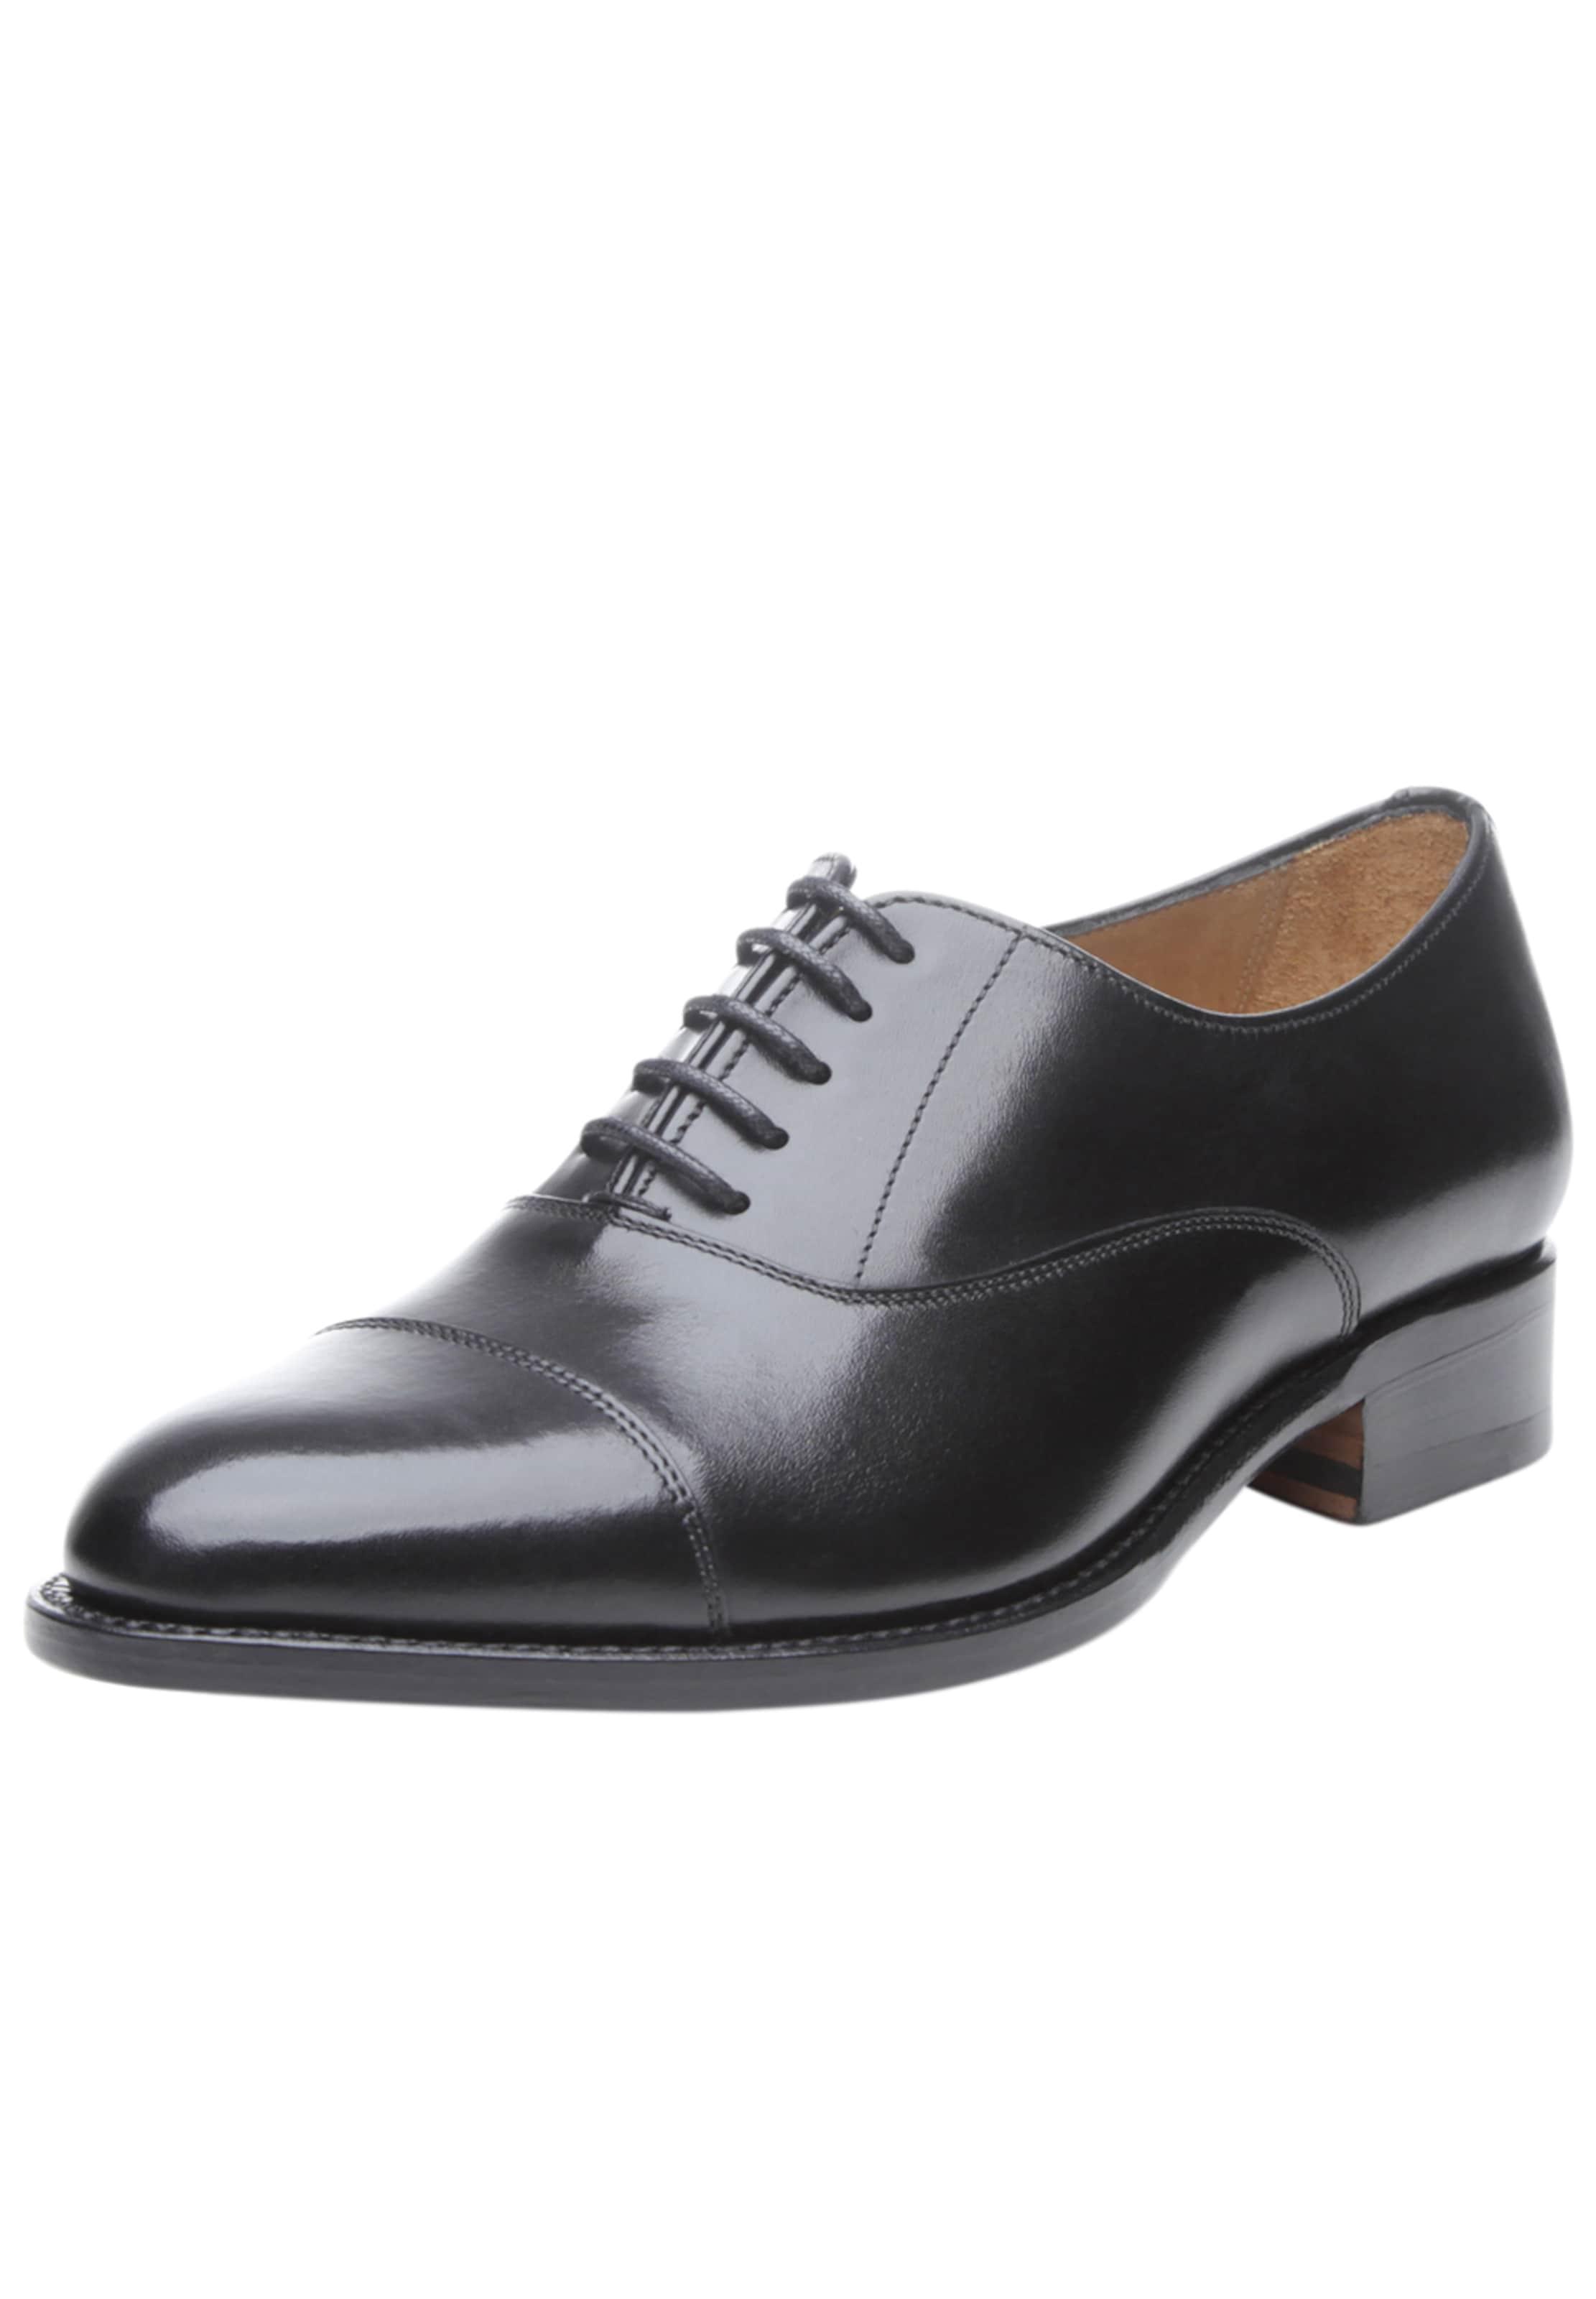 Haltbare Mode billige Schuhe SHOEPASSION | Schnürschuhe 'No. 1105' Schuhe Gut getragene Schuhe